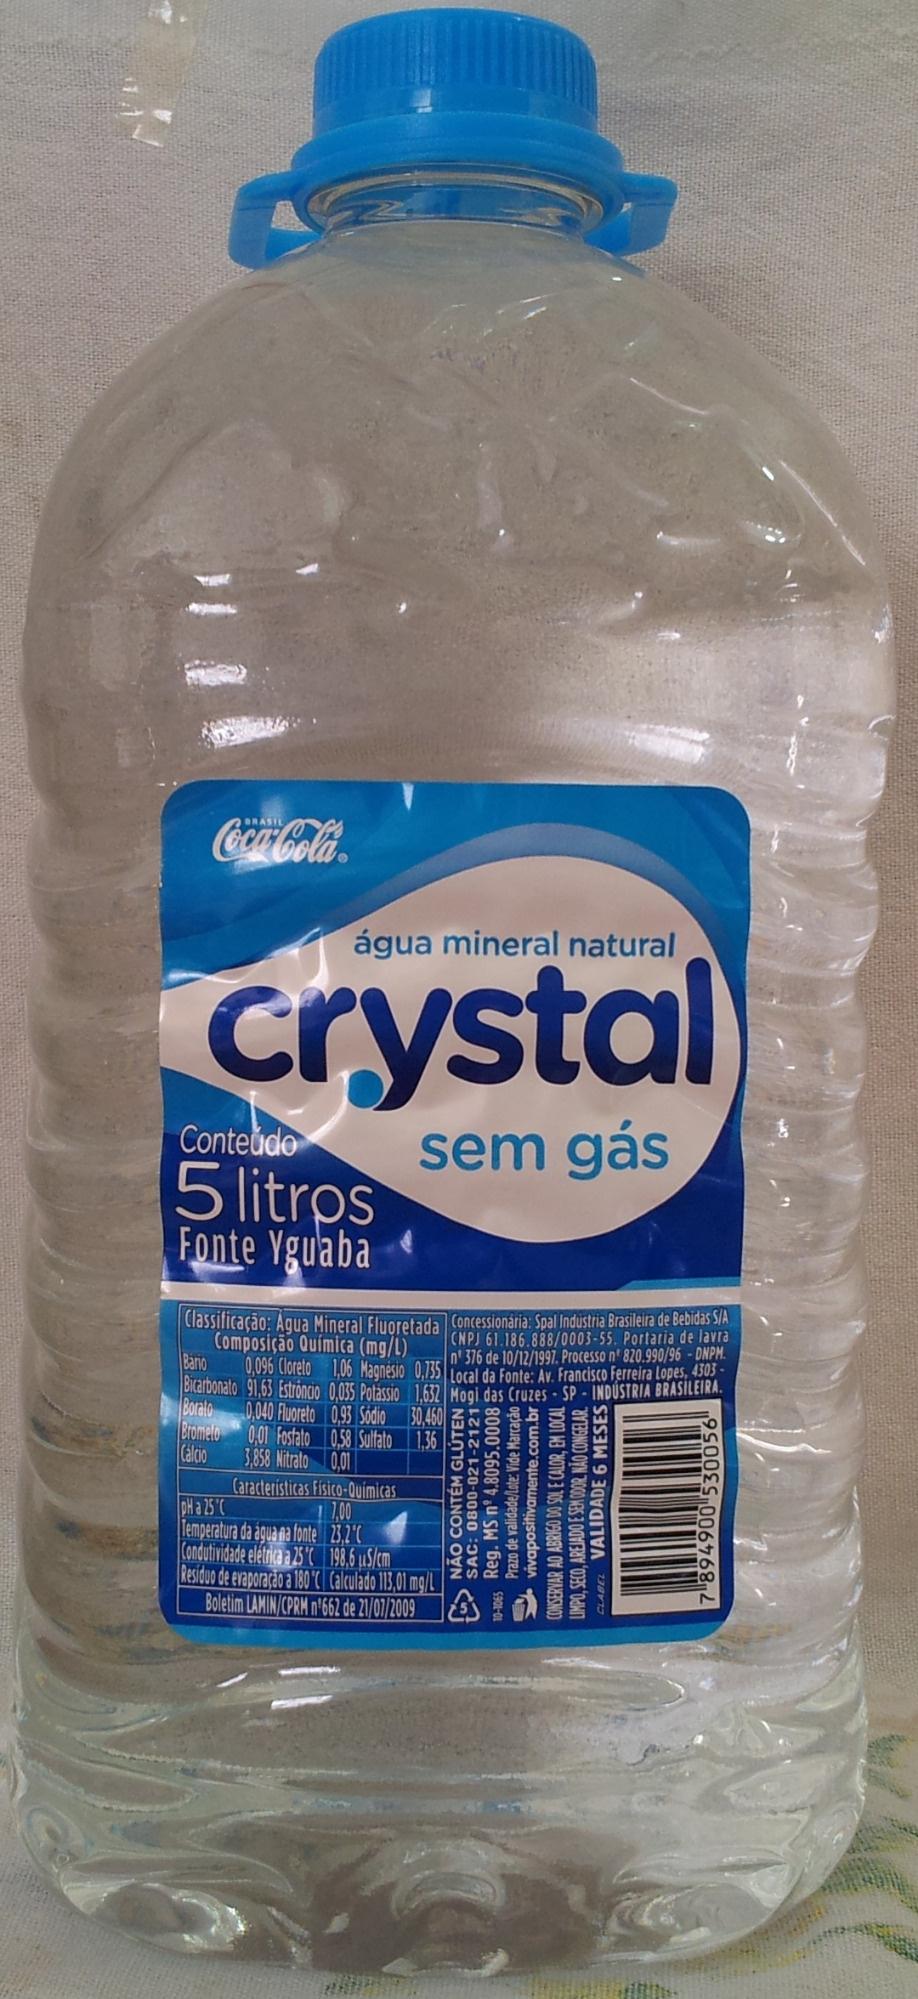 Água Mineral Natural Crystal Sem Gás - Product